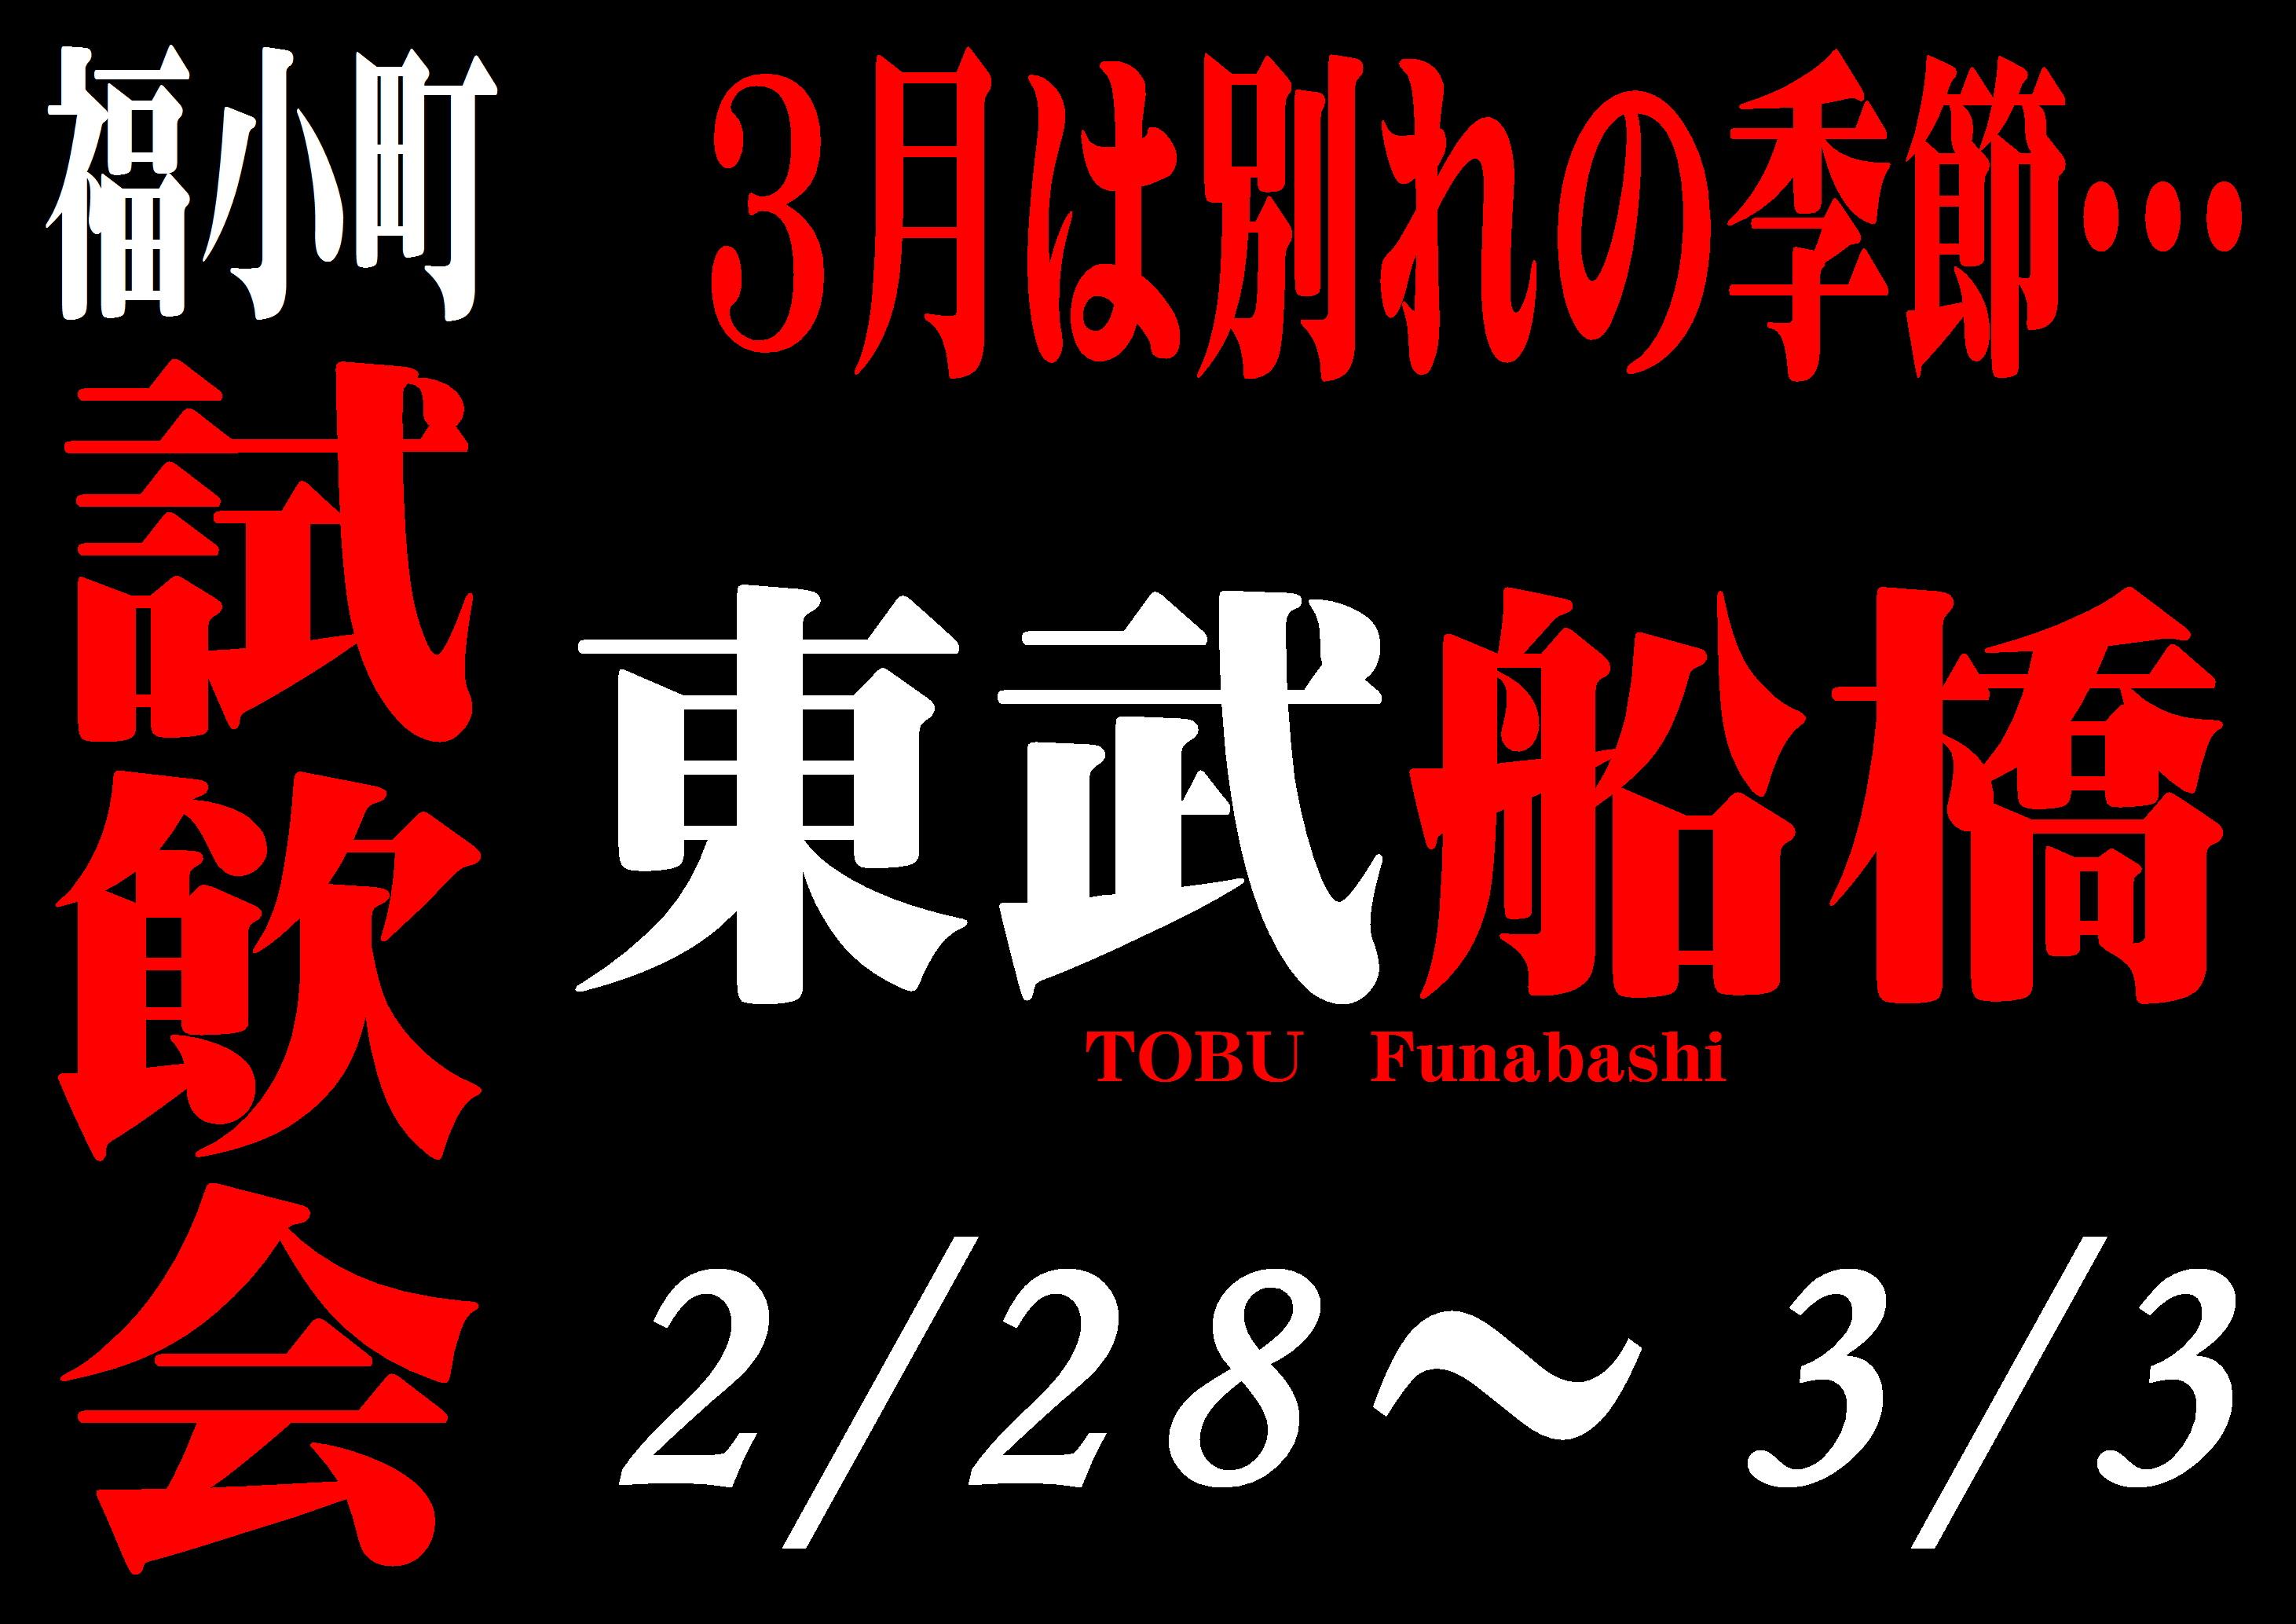 http://www.fukukomachi.com/blog/photo/20190301.JPG